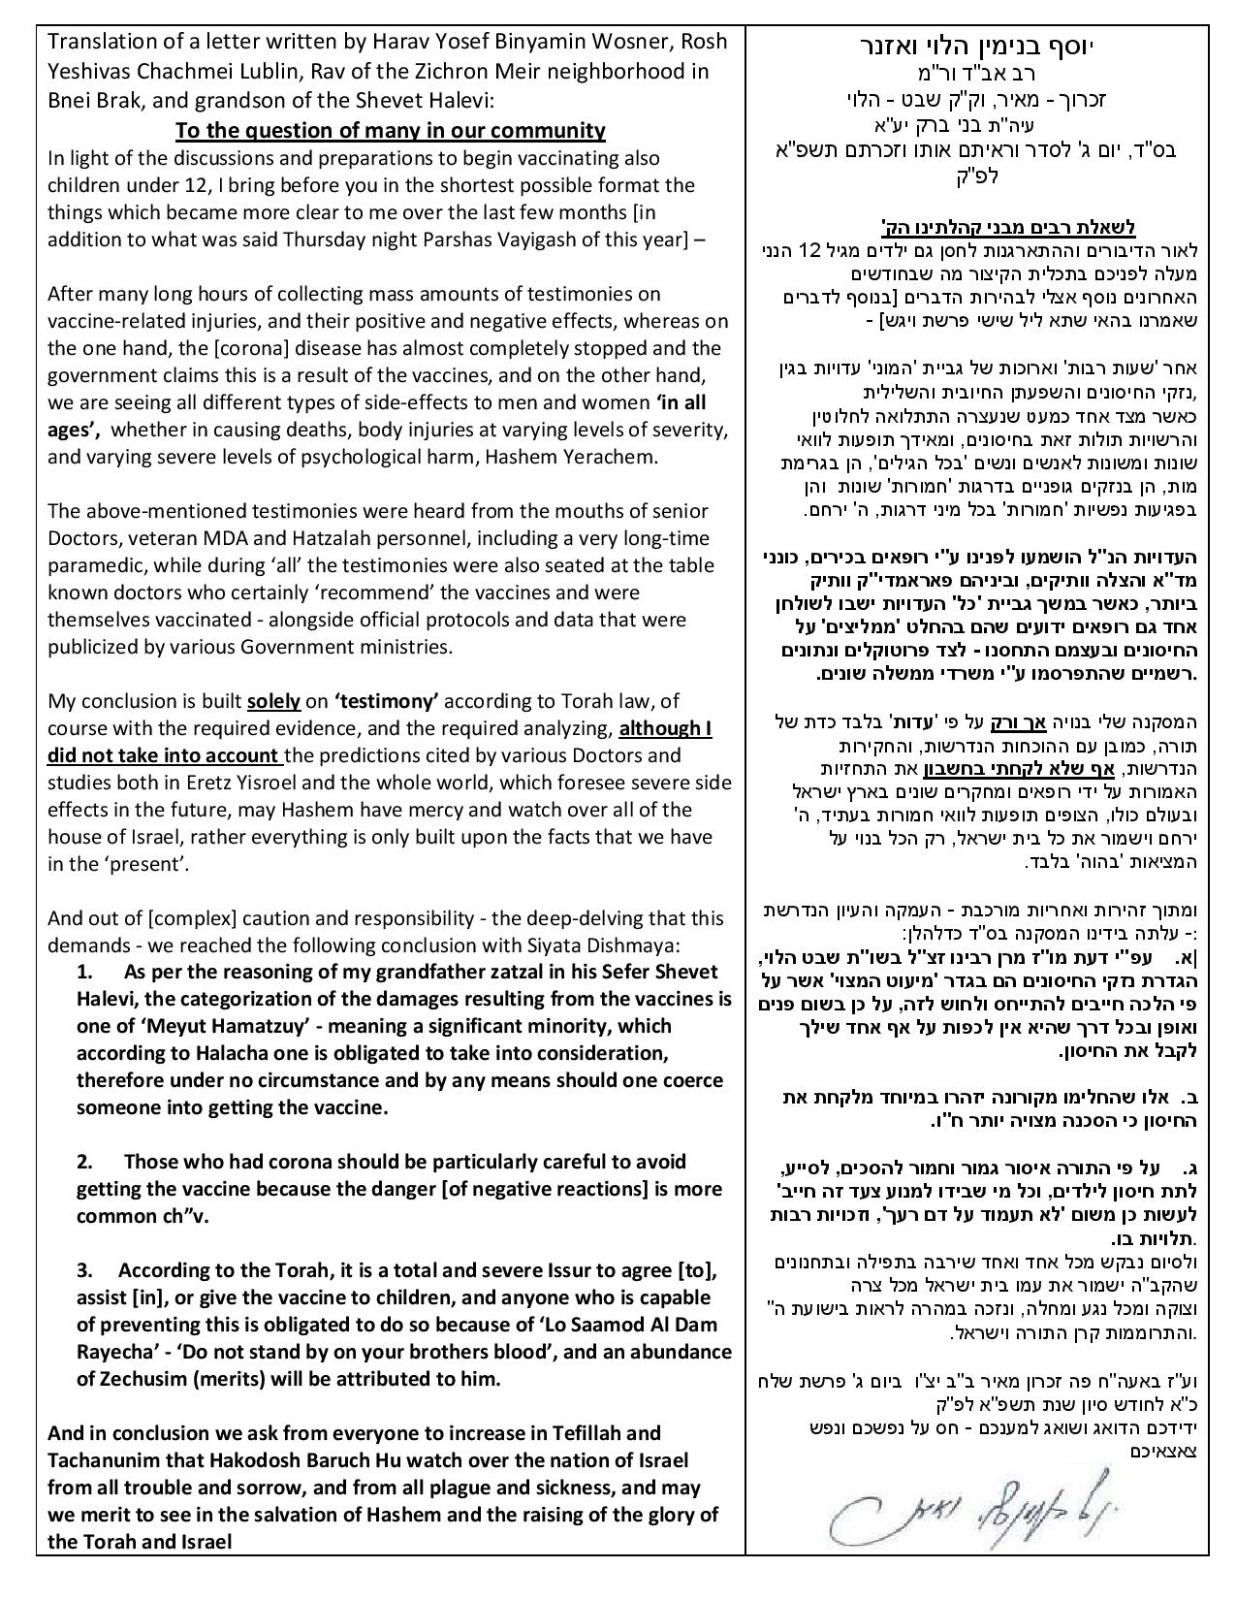 Rabbi Wosner against vaccine for children